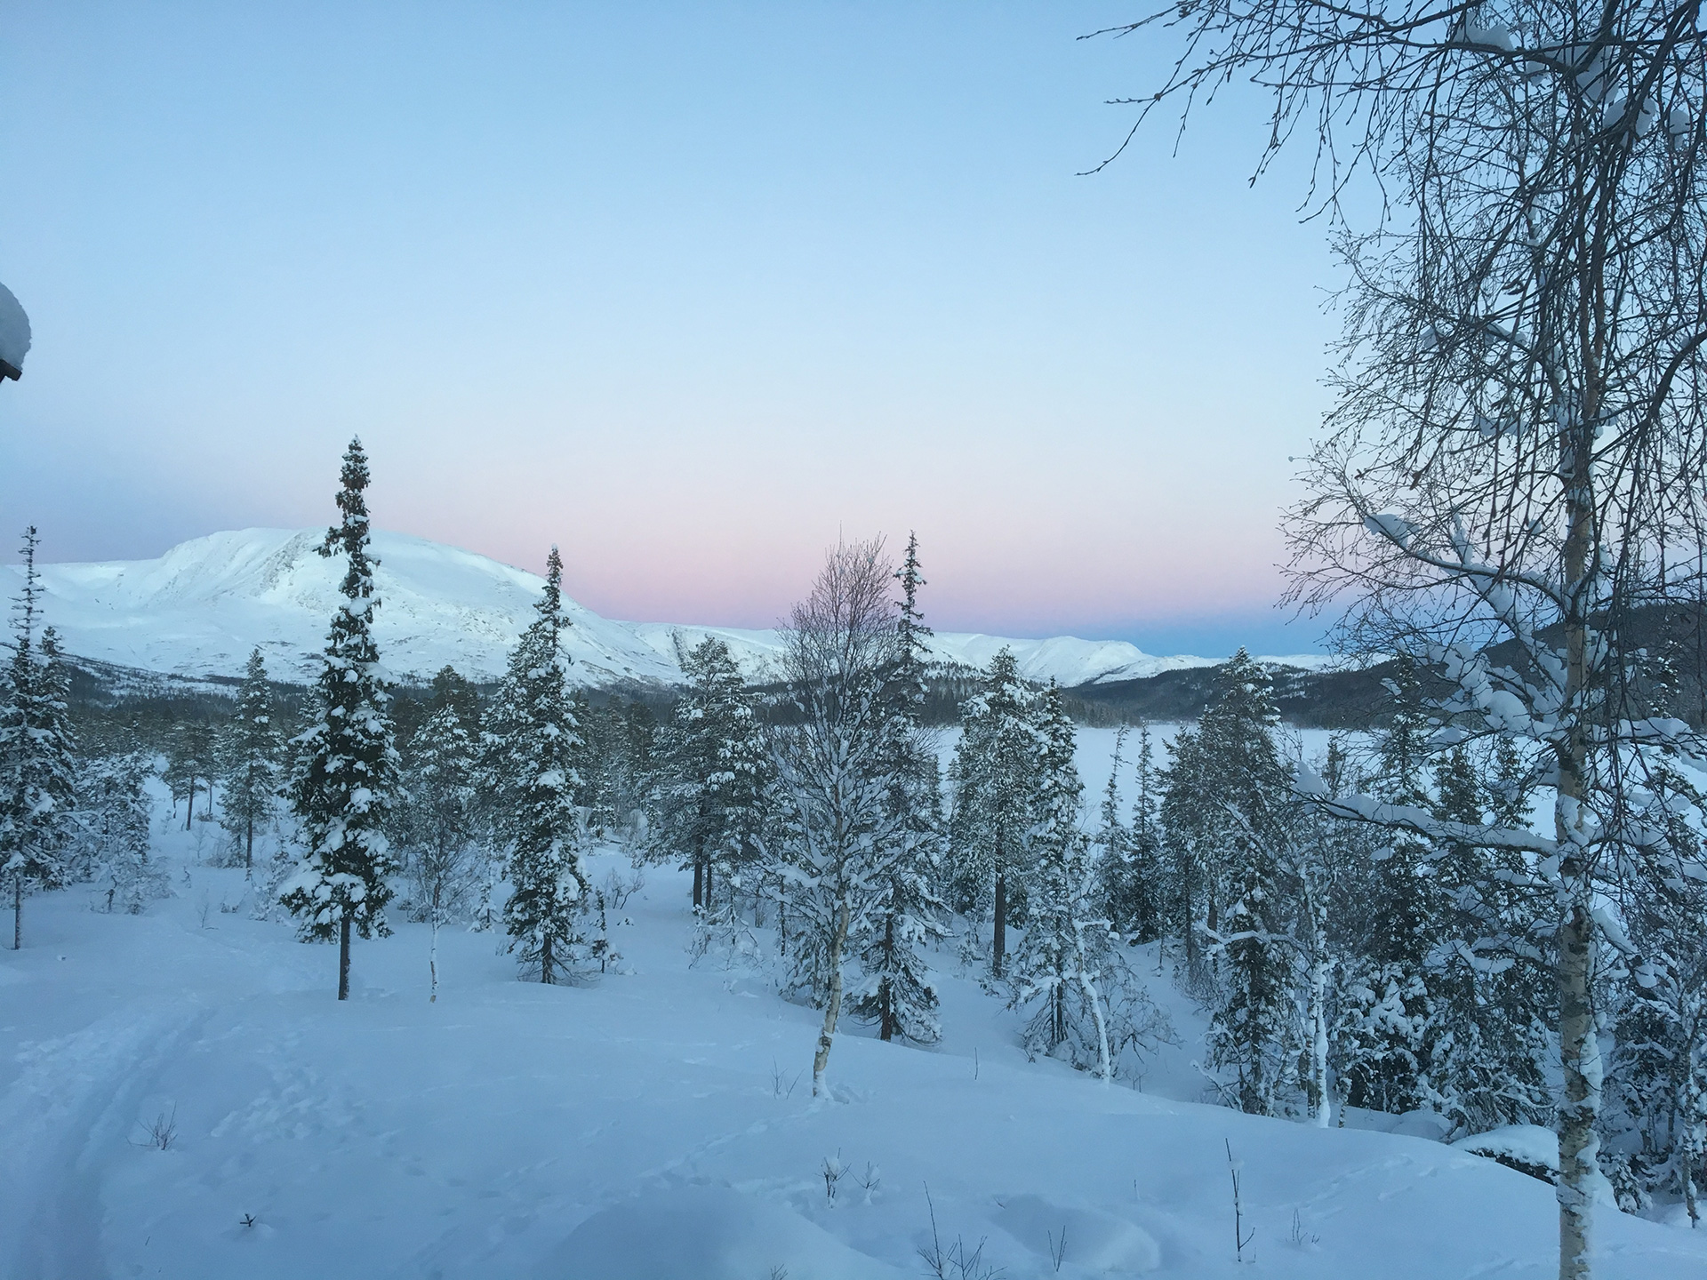 Picture of a winter landscape